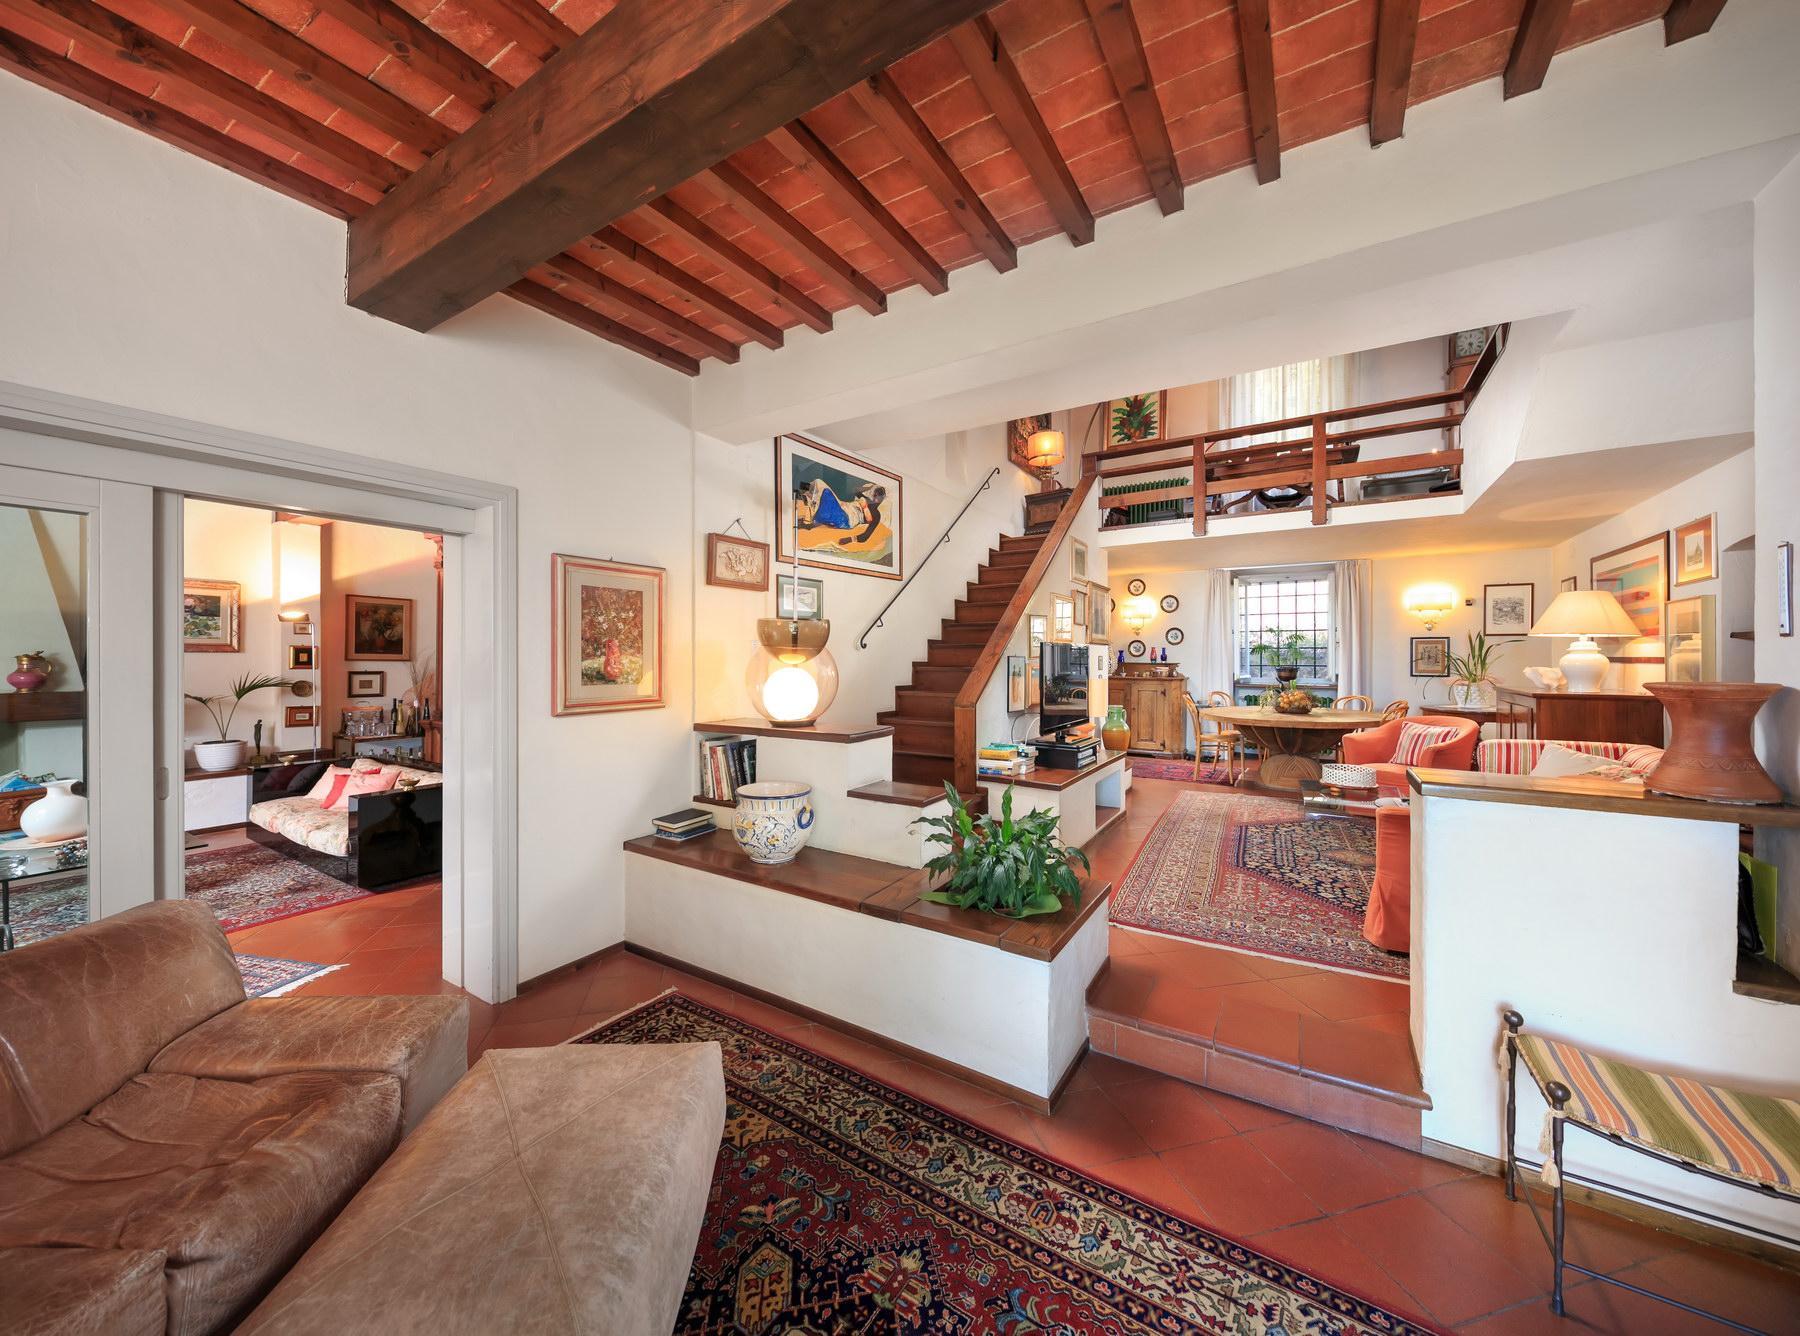 Wonderful farmhouse on the Tuscan hills - 10